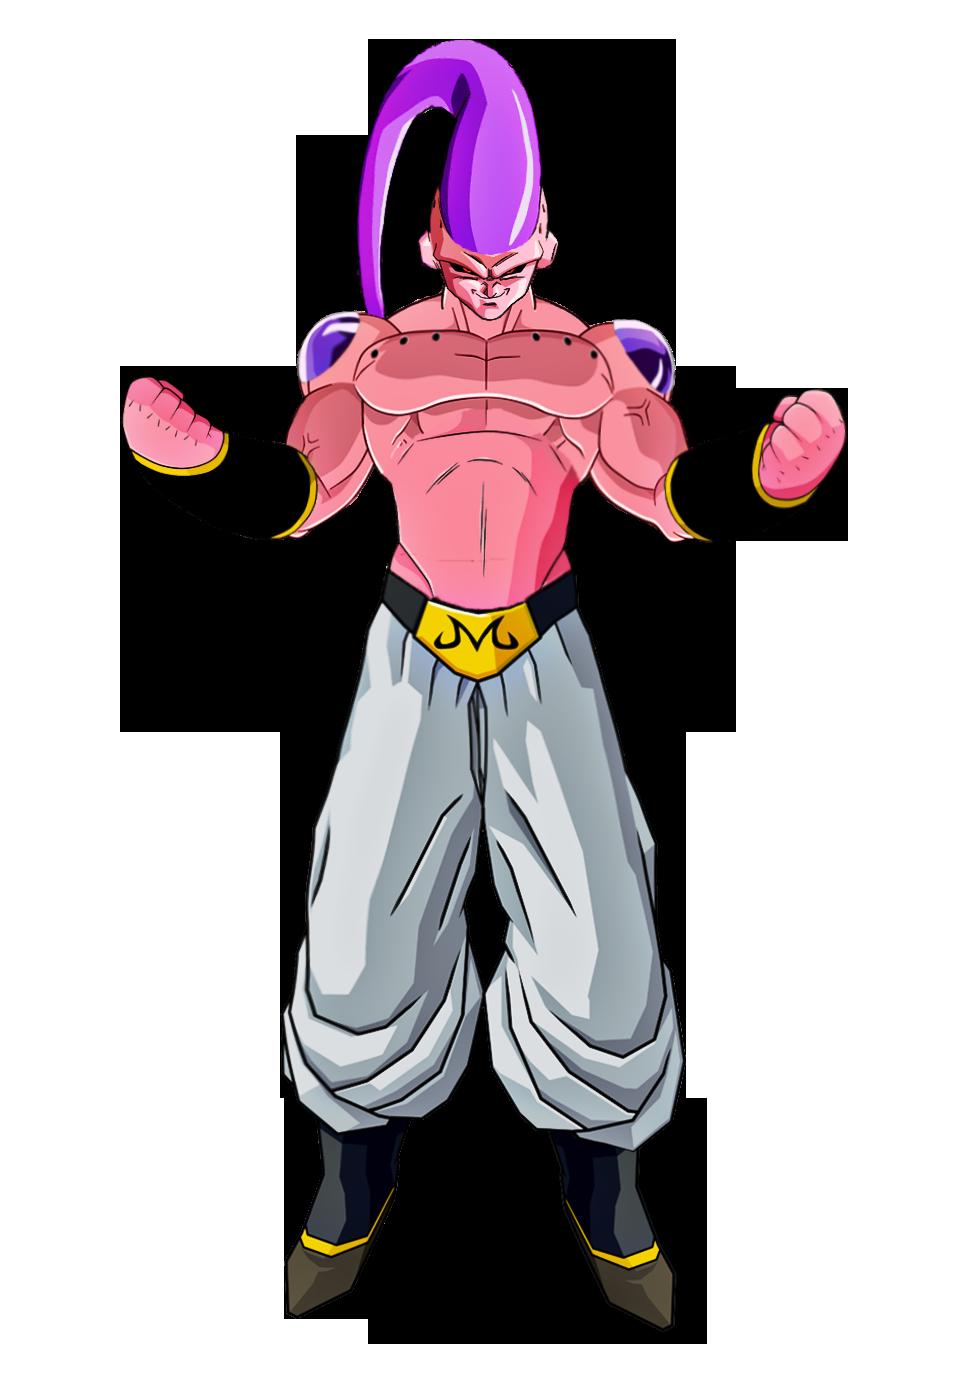 Majin buu character giant. Muscles clipart endurance